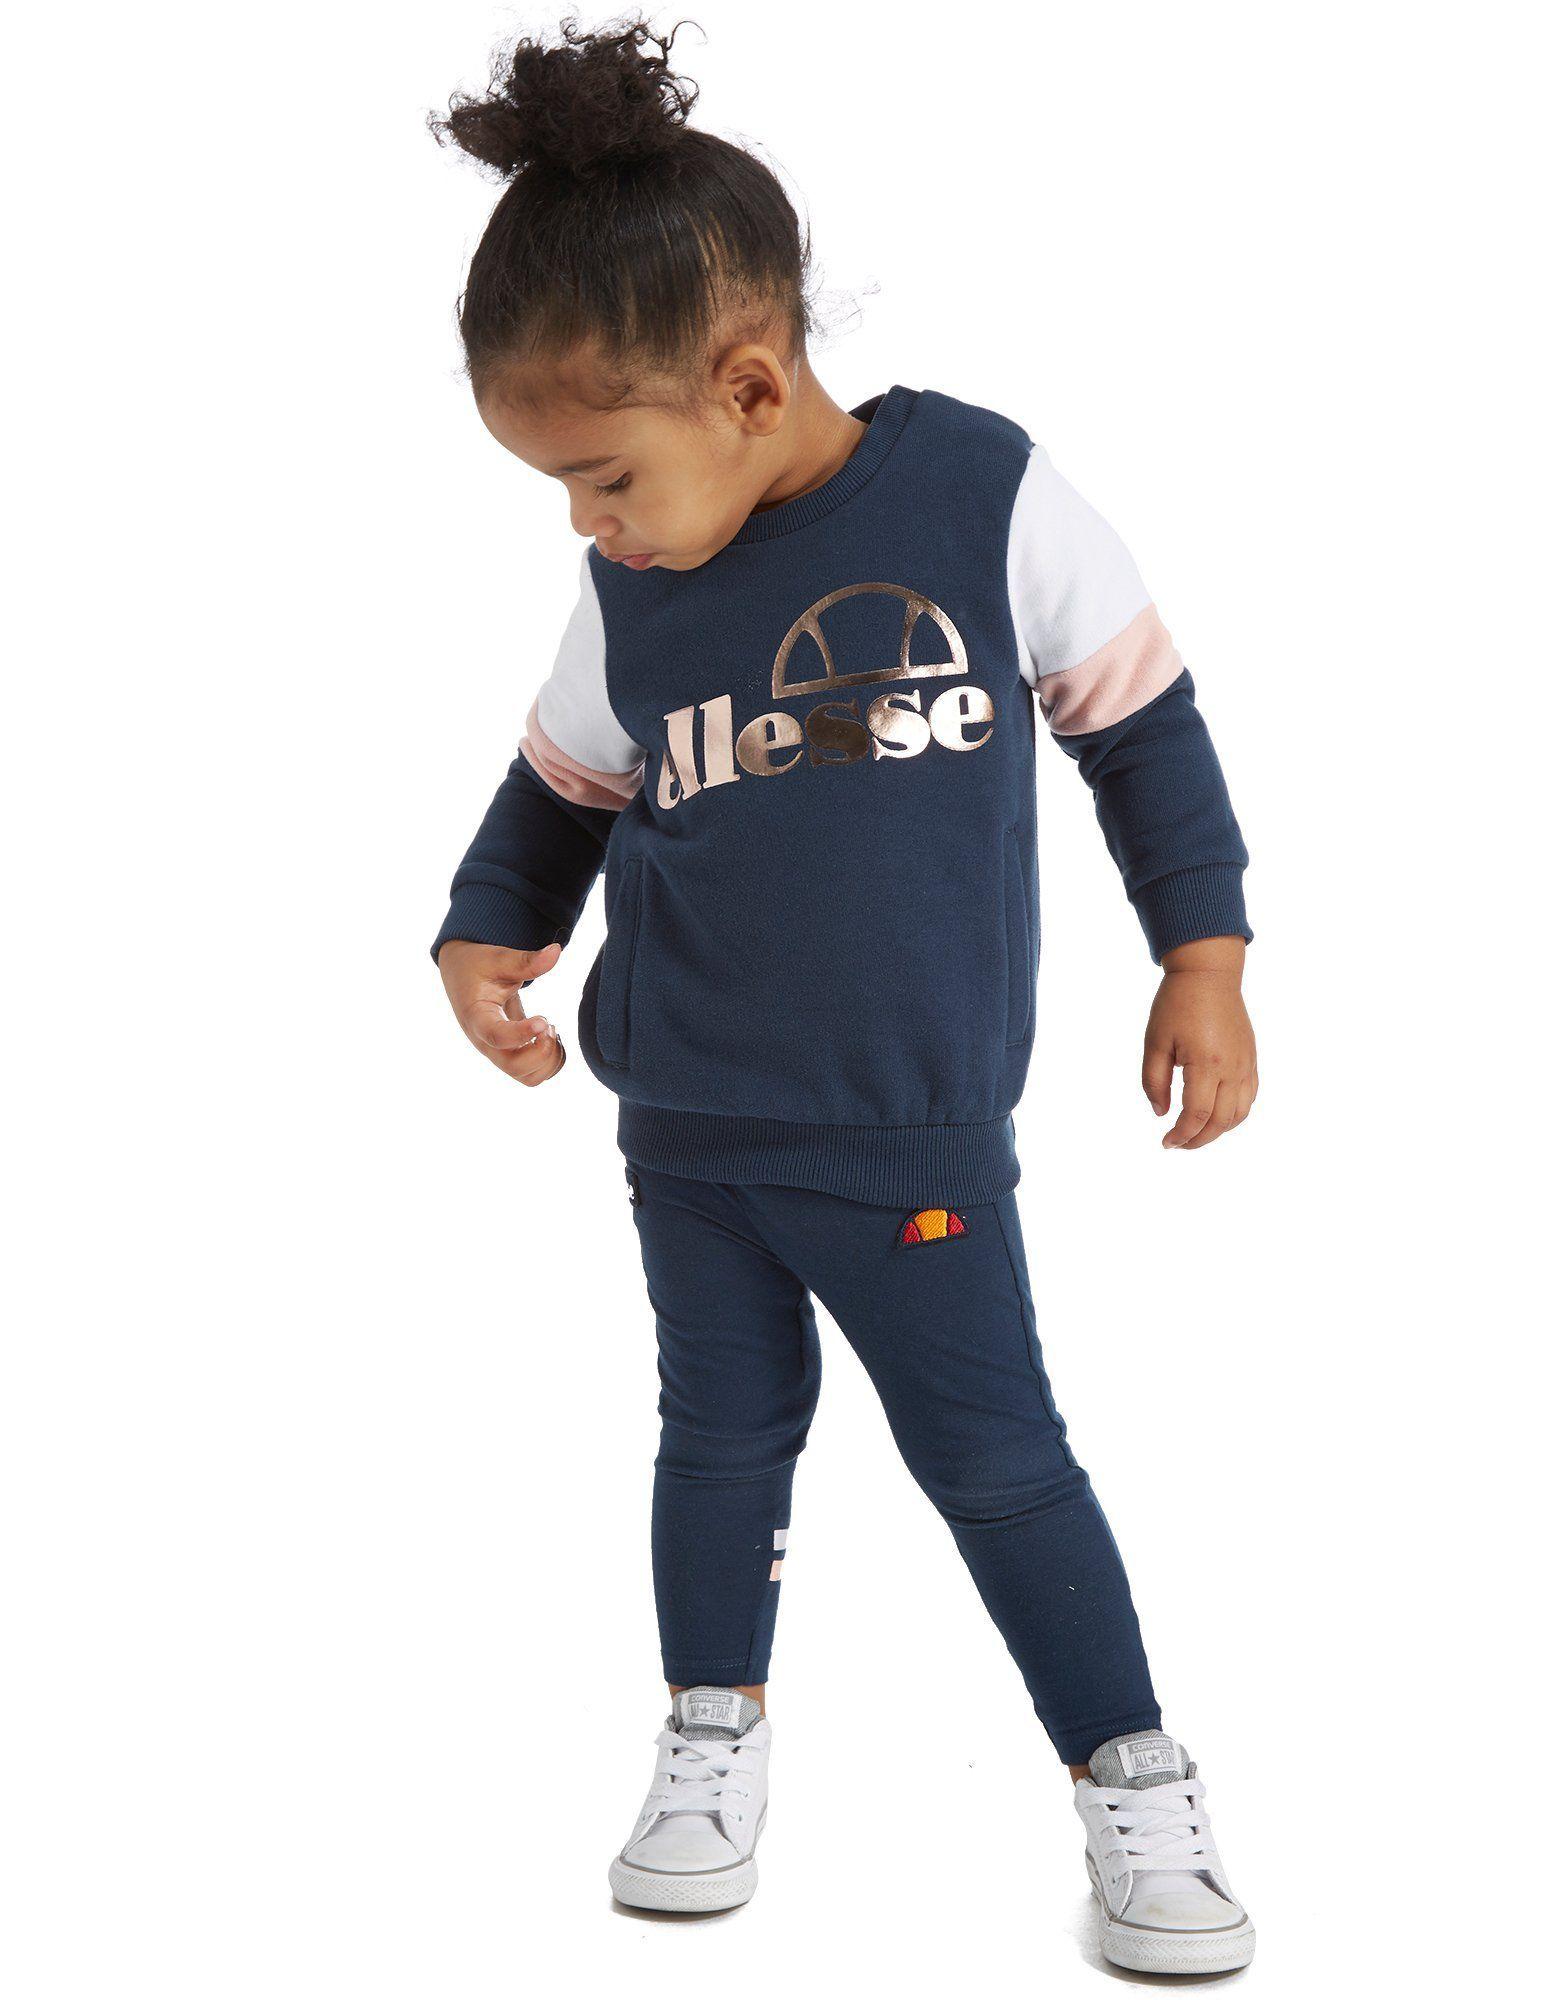 eb13fd4f Ellesse Girls' Monarca Set Infant - Shop online for Ellesse Girls' Monarca  Set Infant with JD Sports, the UK's leading sports fashion retailer.